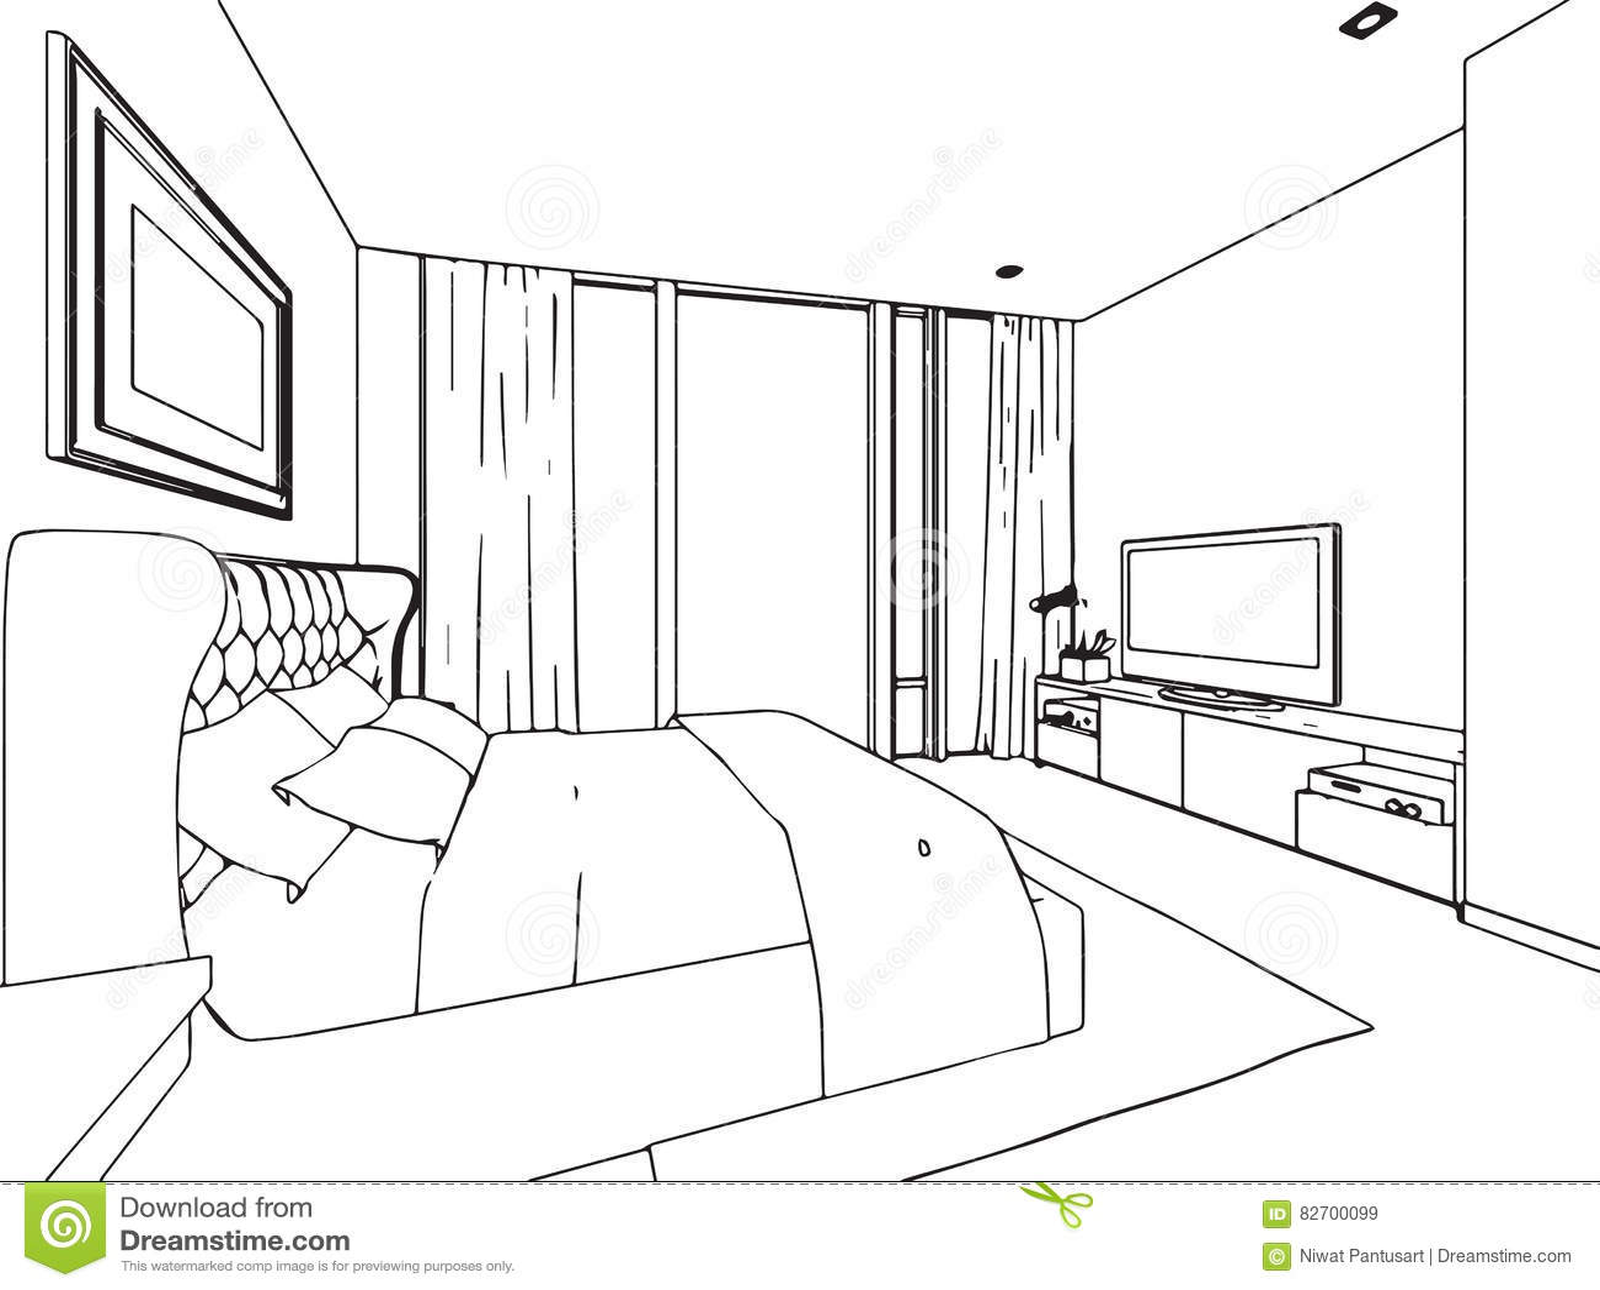 Canape Moderne Dessin Perspective : Dessin perspective maison ventana